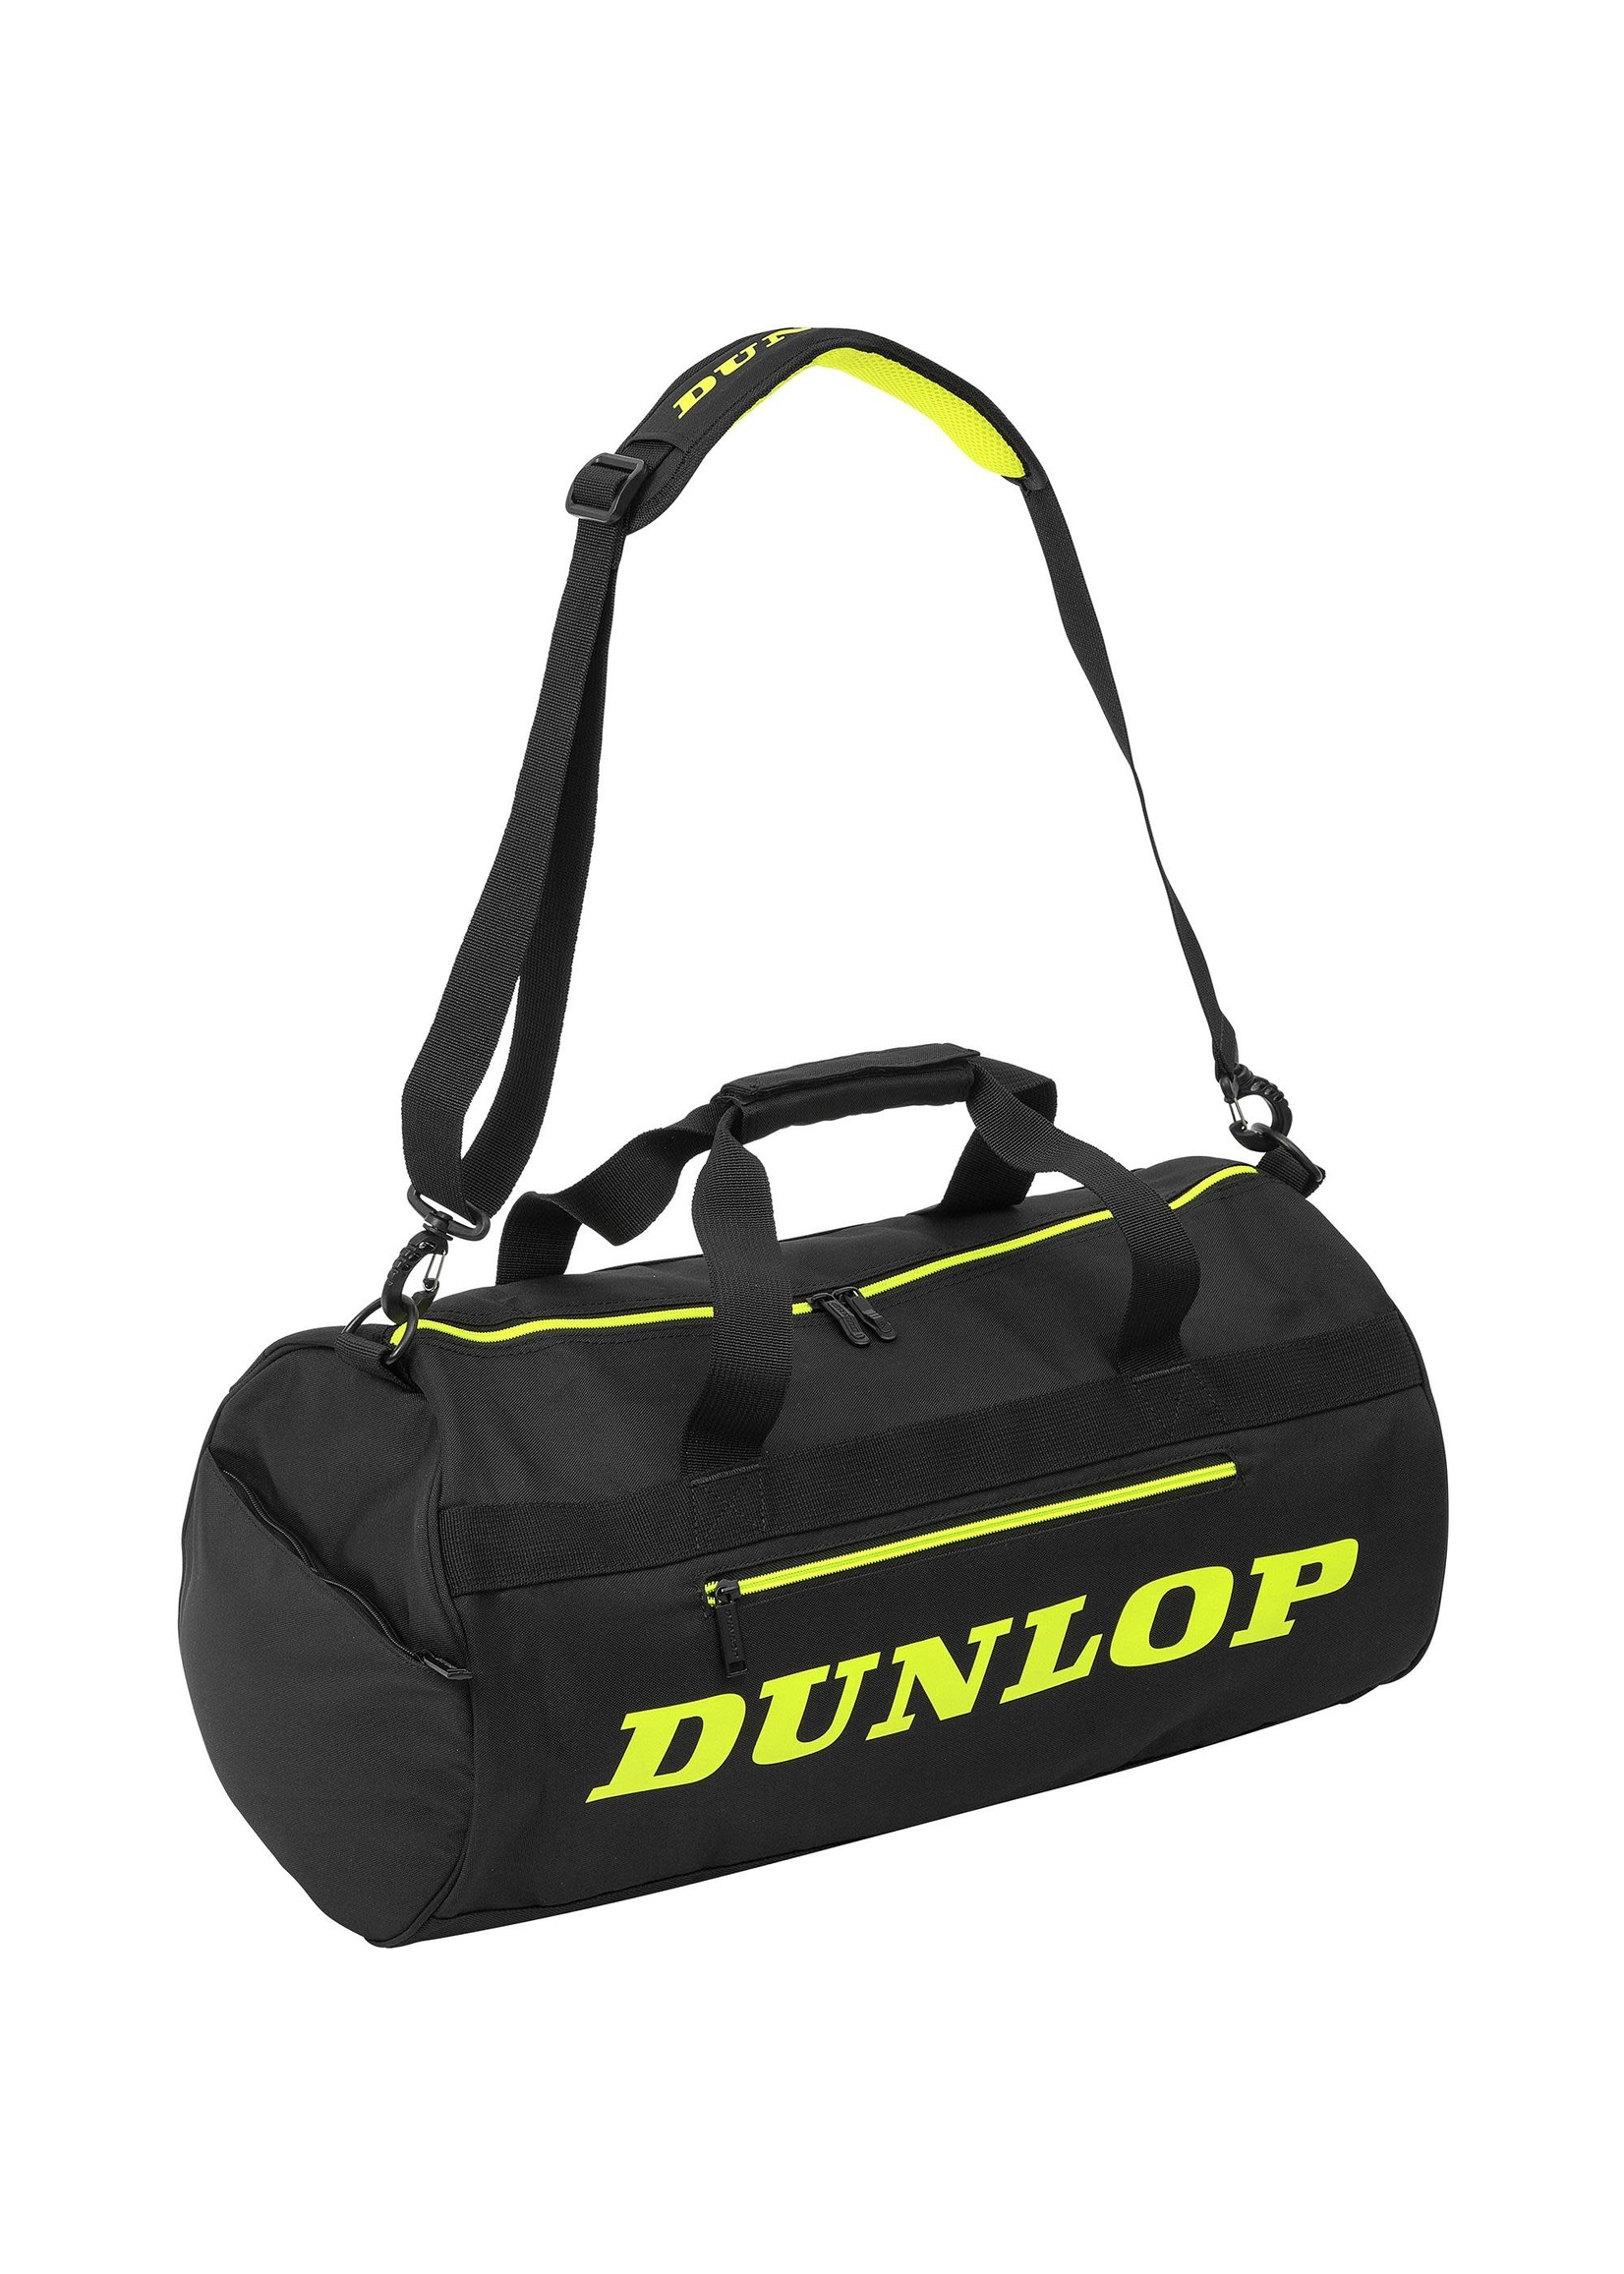 Dunlop Srixon Dunlop SX Performance Thermo Duffle Bag (2020)